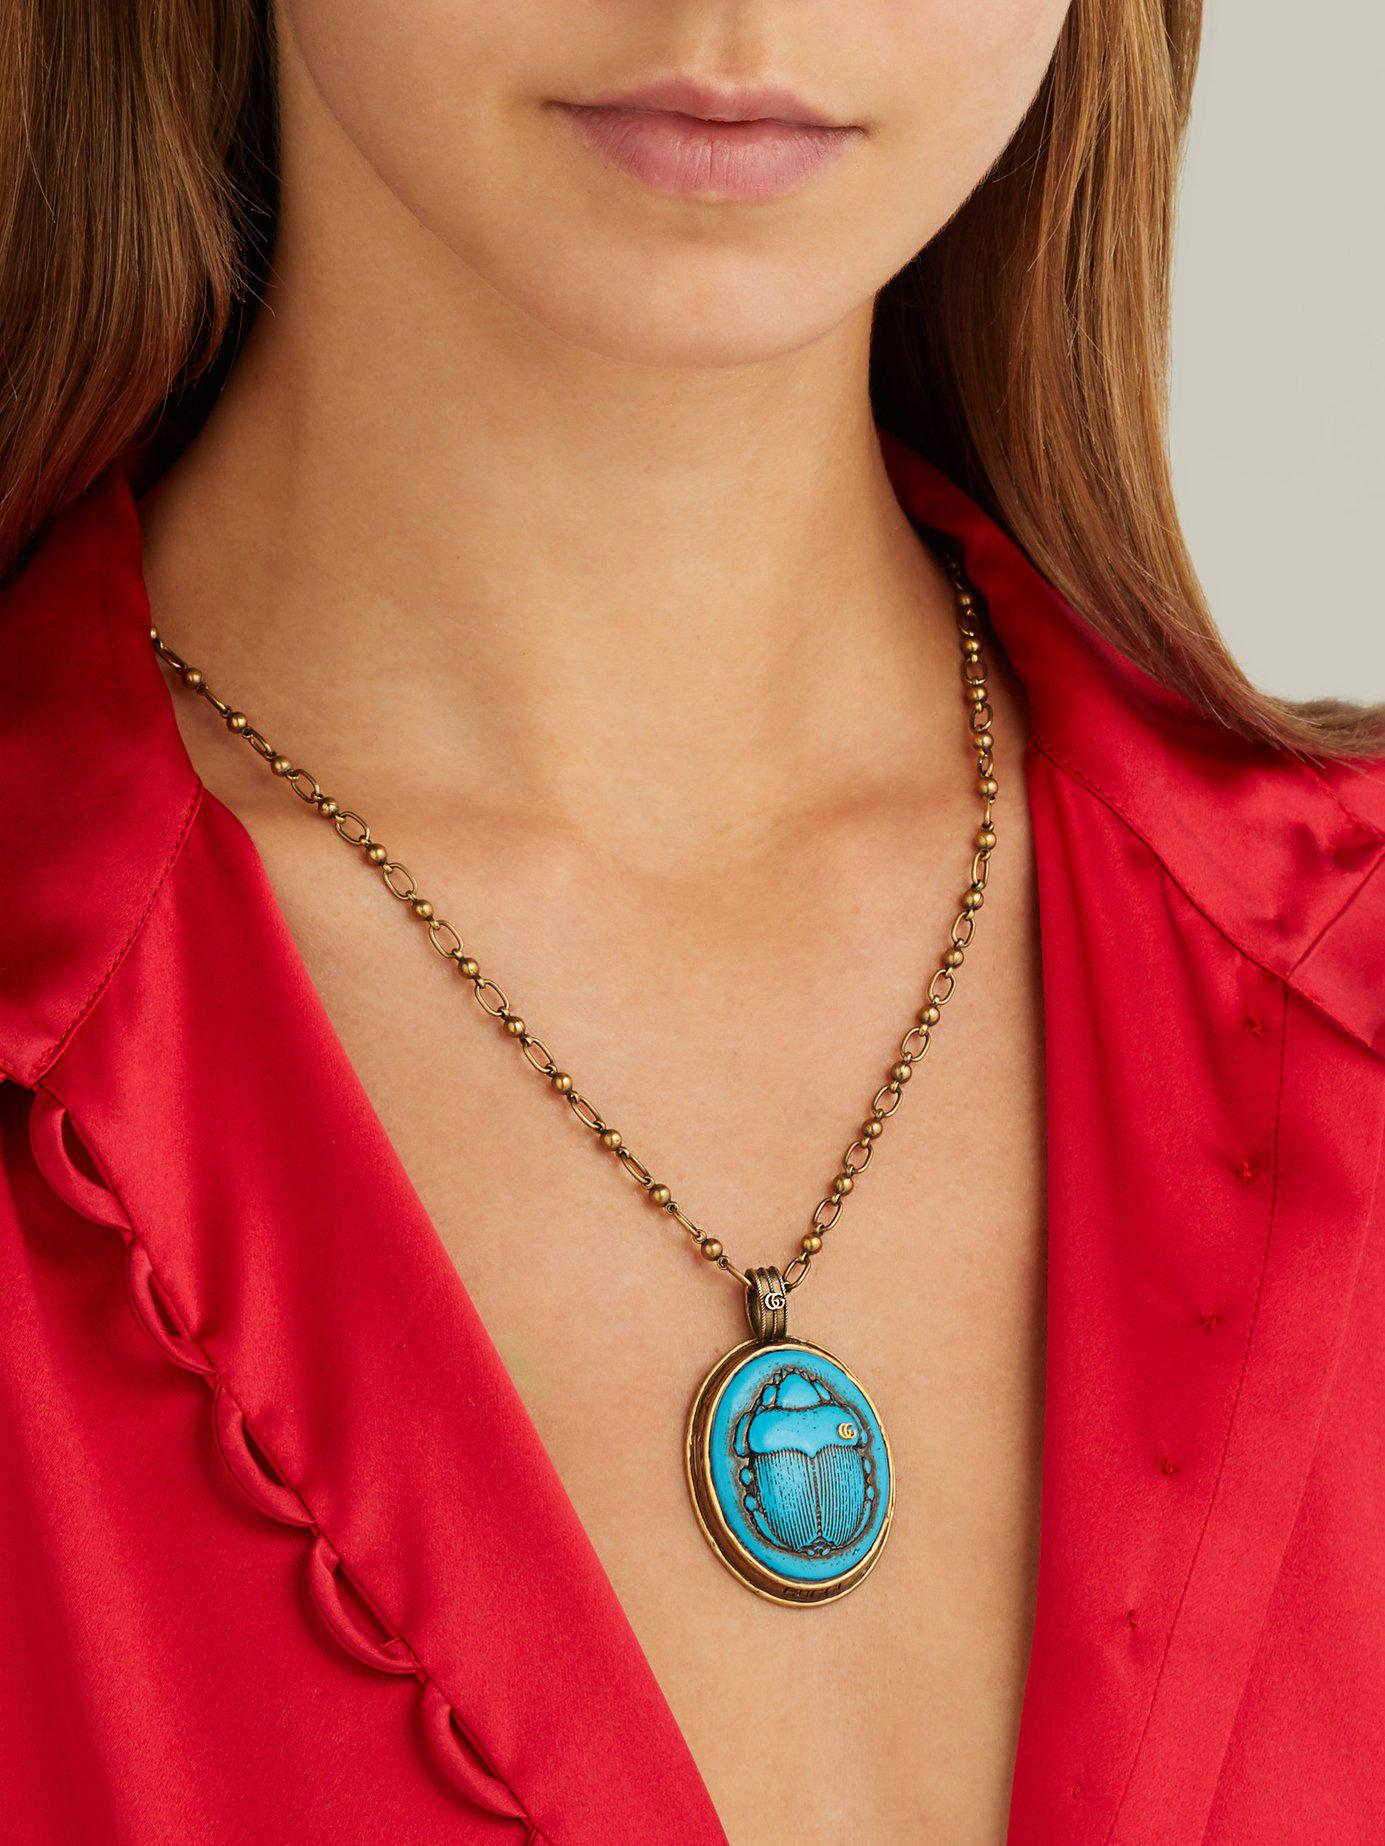 34a148fd3a3 Gucci - Blue Beetle Pendant Necklace - Lyst. View fullscreen